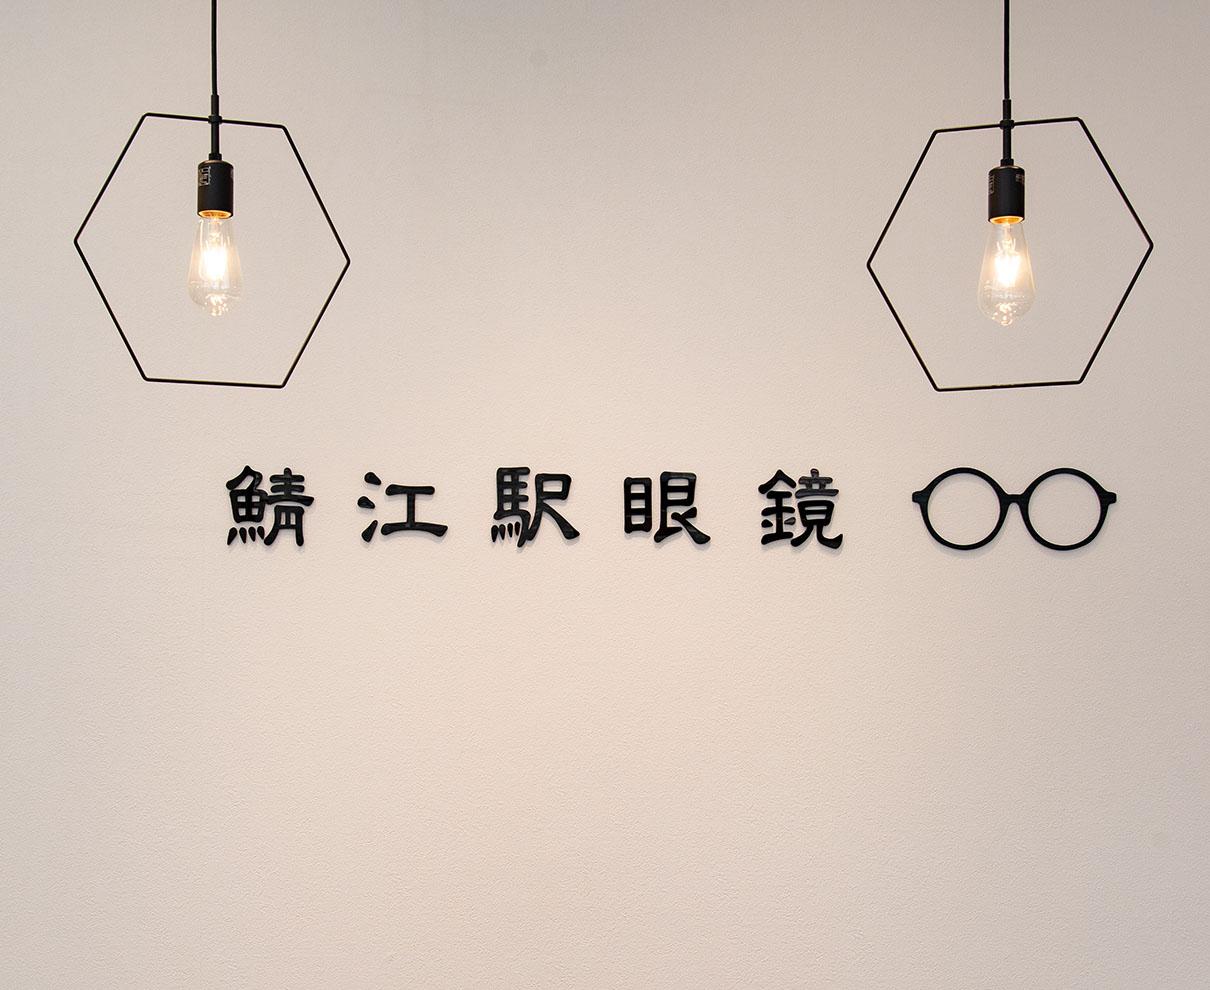 【Open】メガネの修理も受付けてくれる、JR鯖江駅構内に誕生した産地ならではのメガネ屋さん。